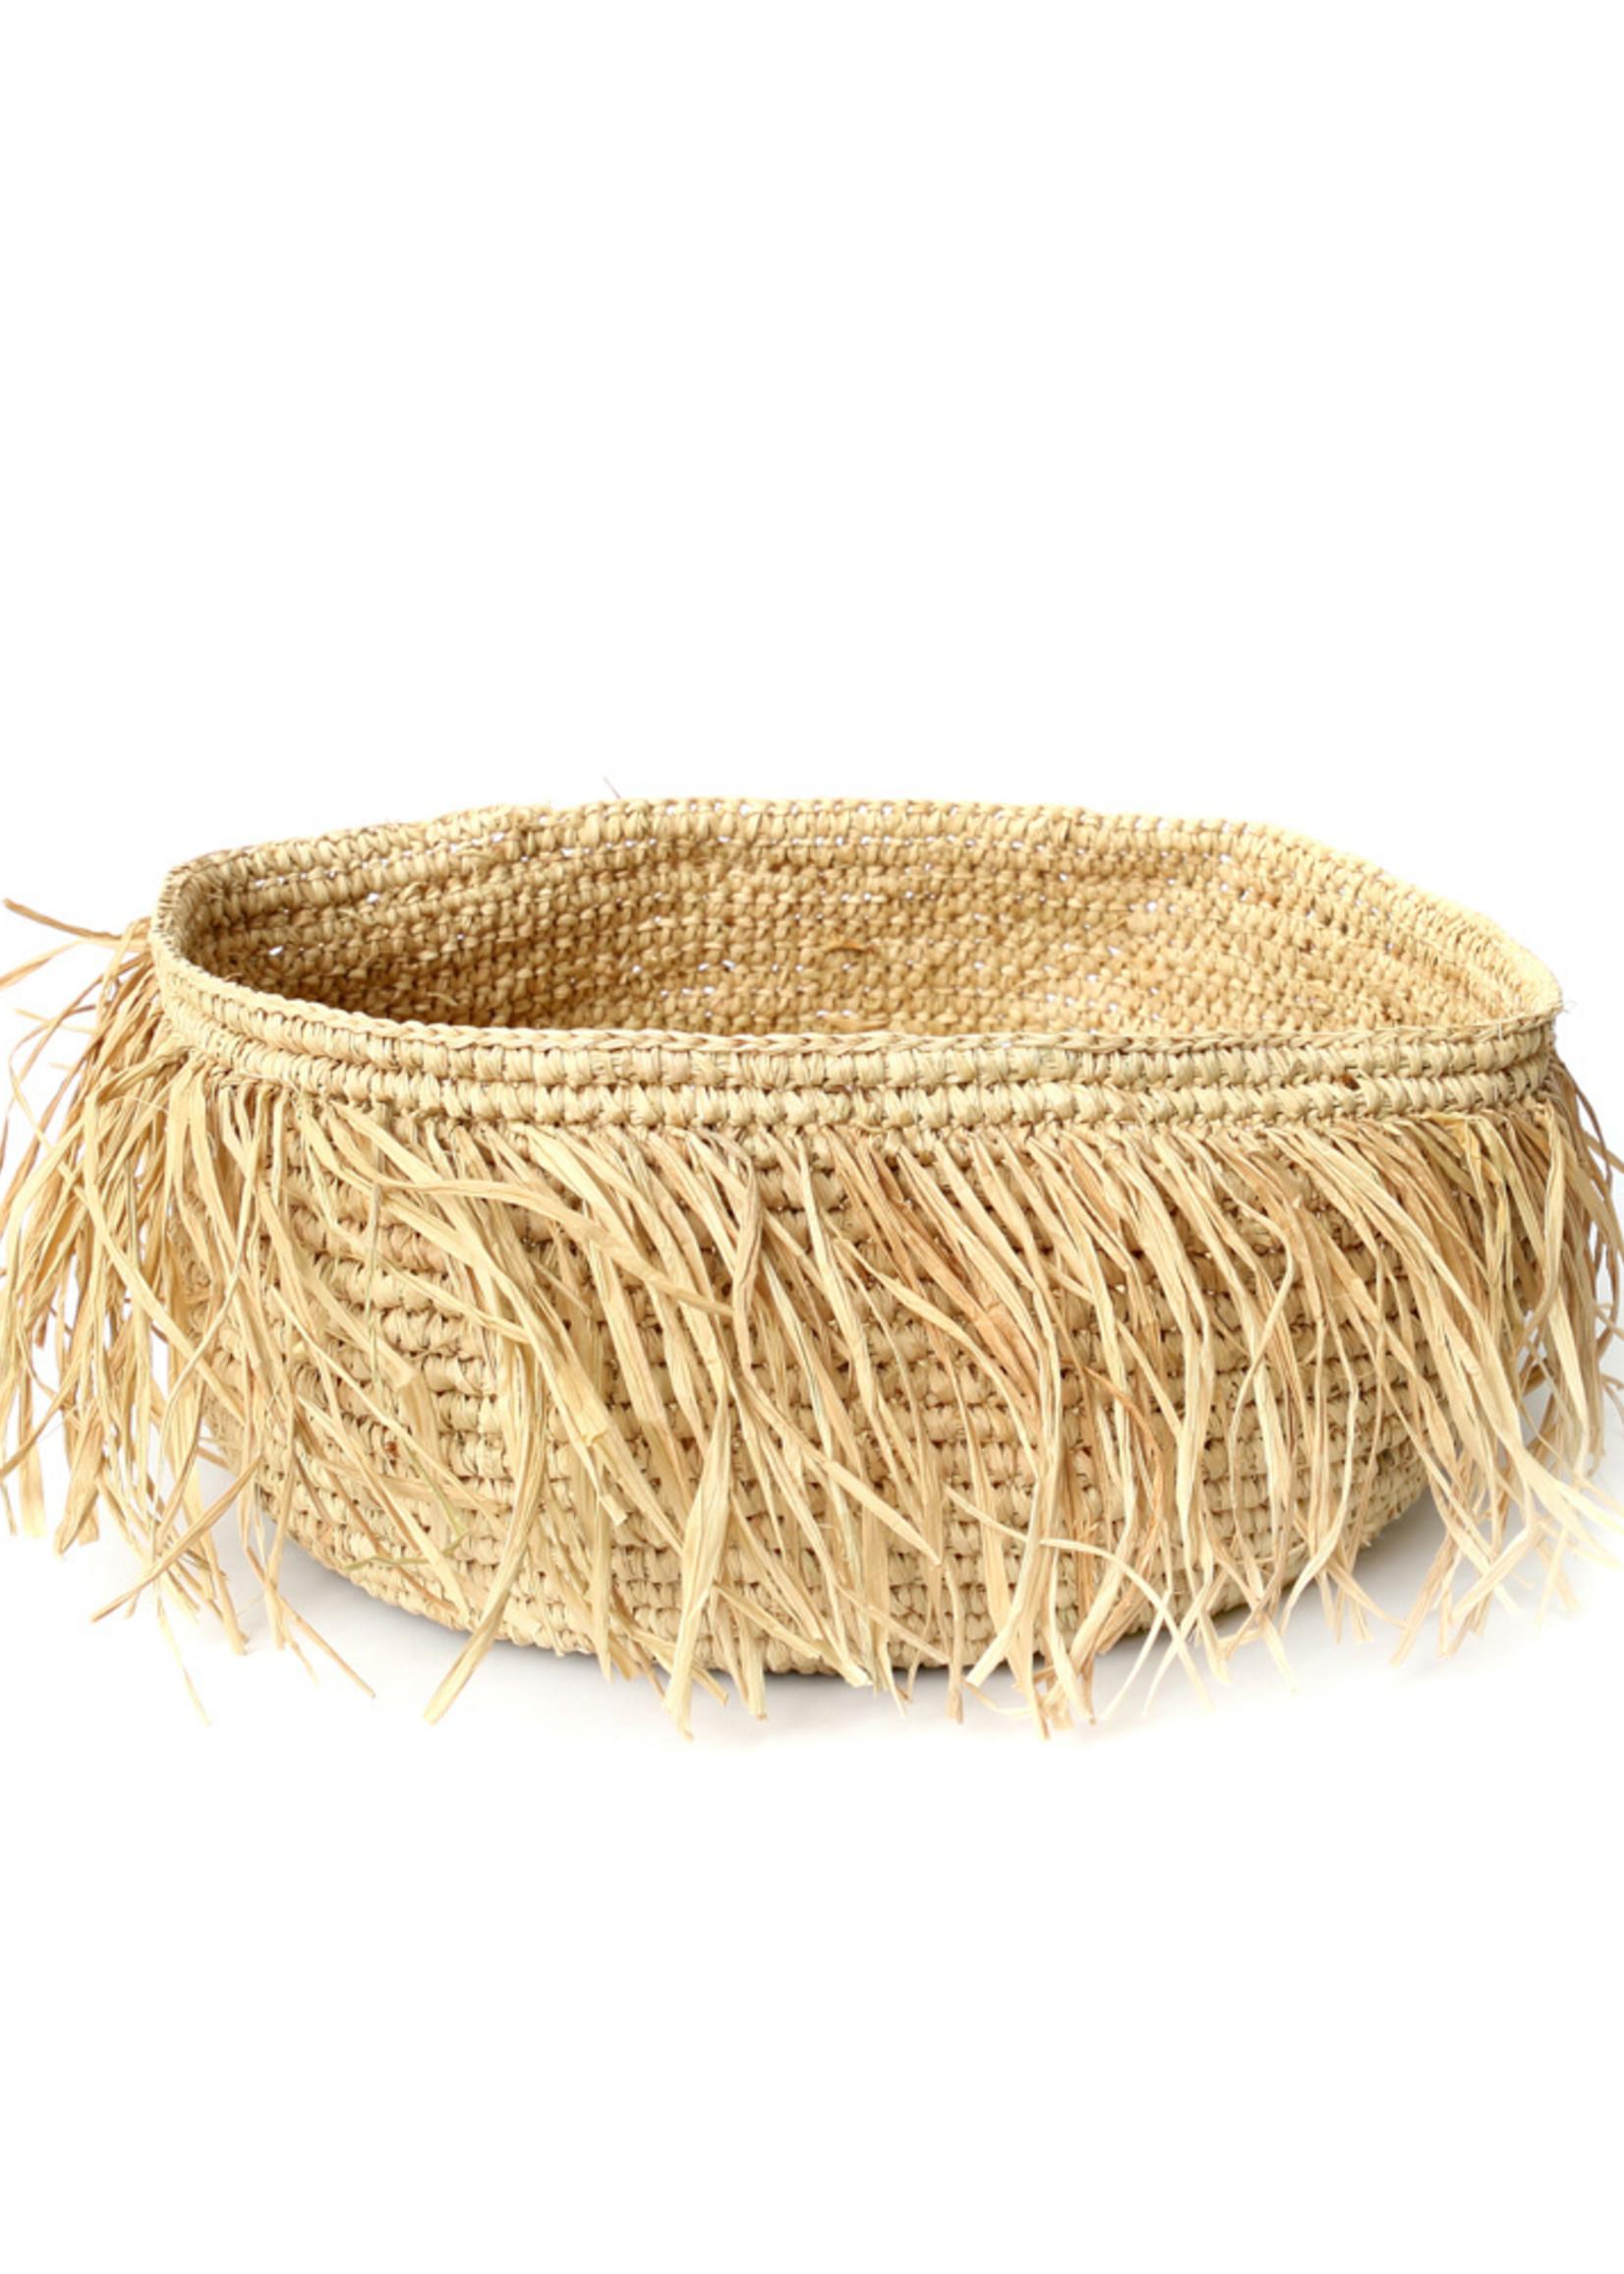 The Raffia Bowl - Natural - M